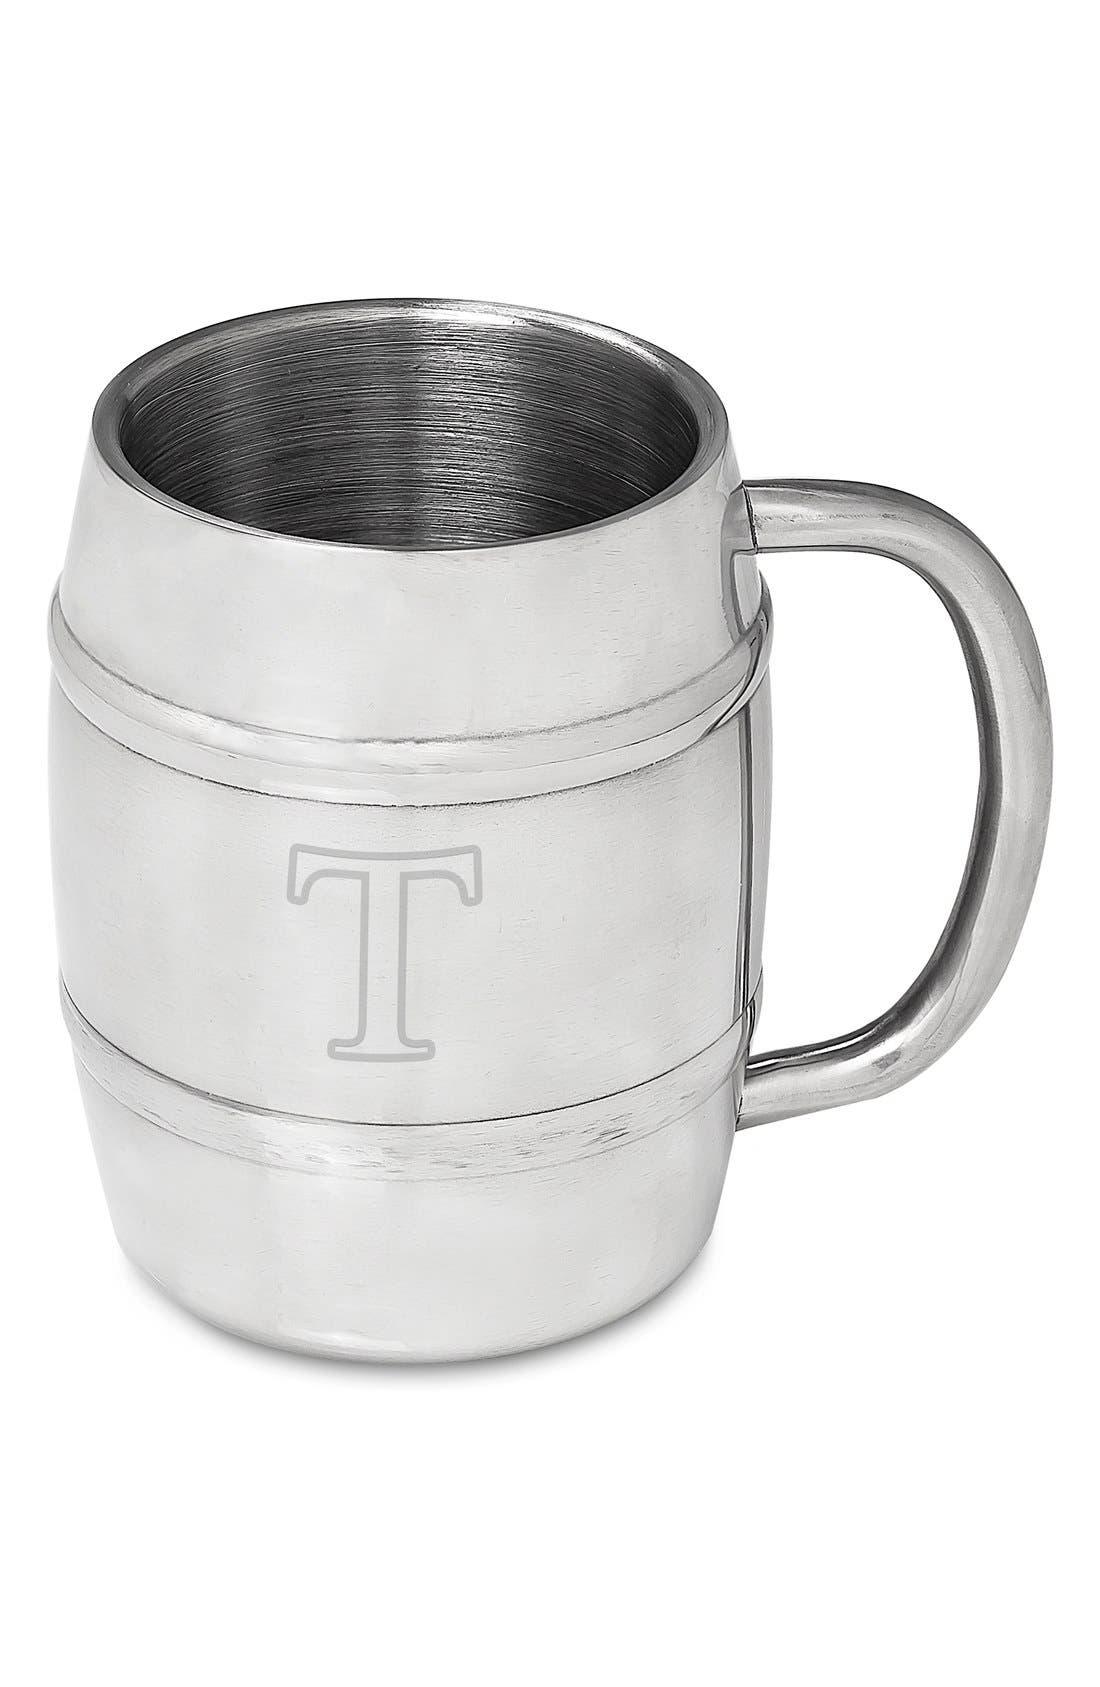 Monogram Stainless Steel Keg Mug,                             Main thumbnail 1, color,